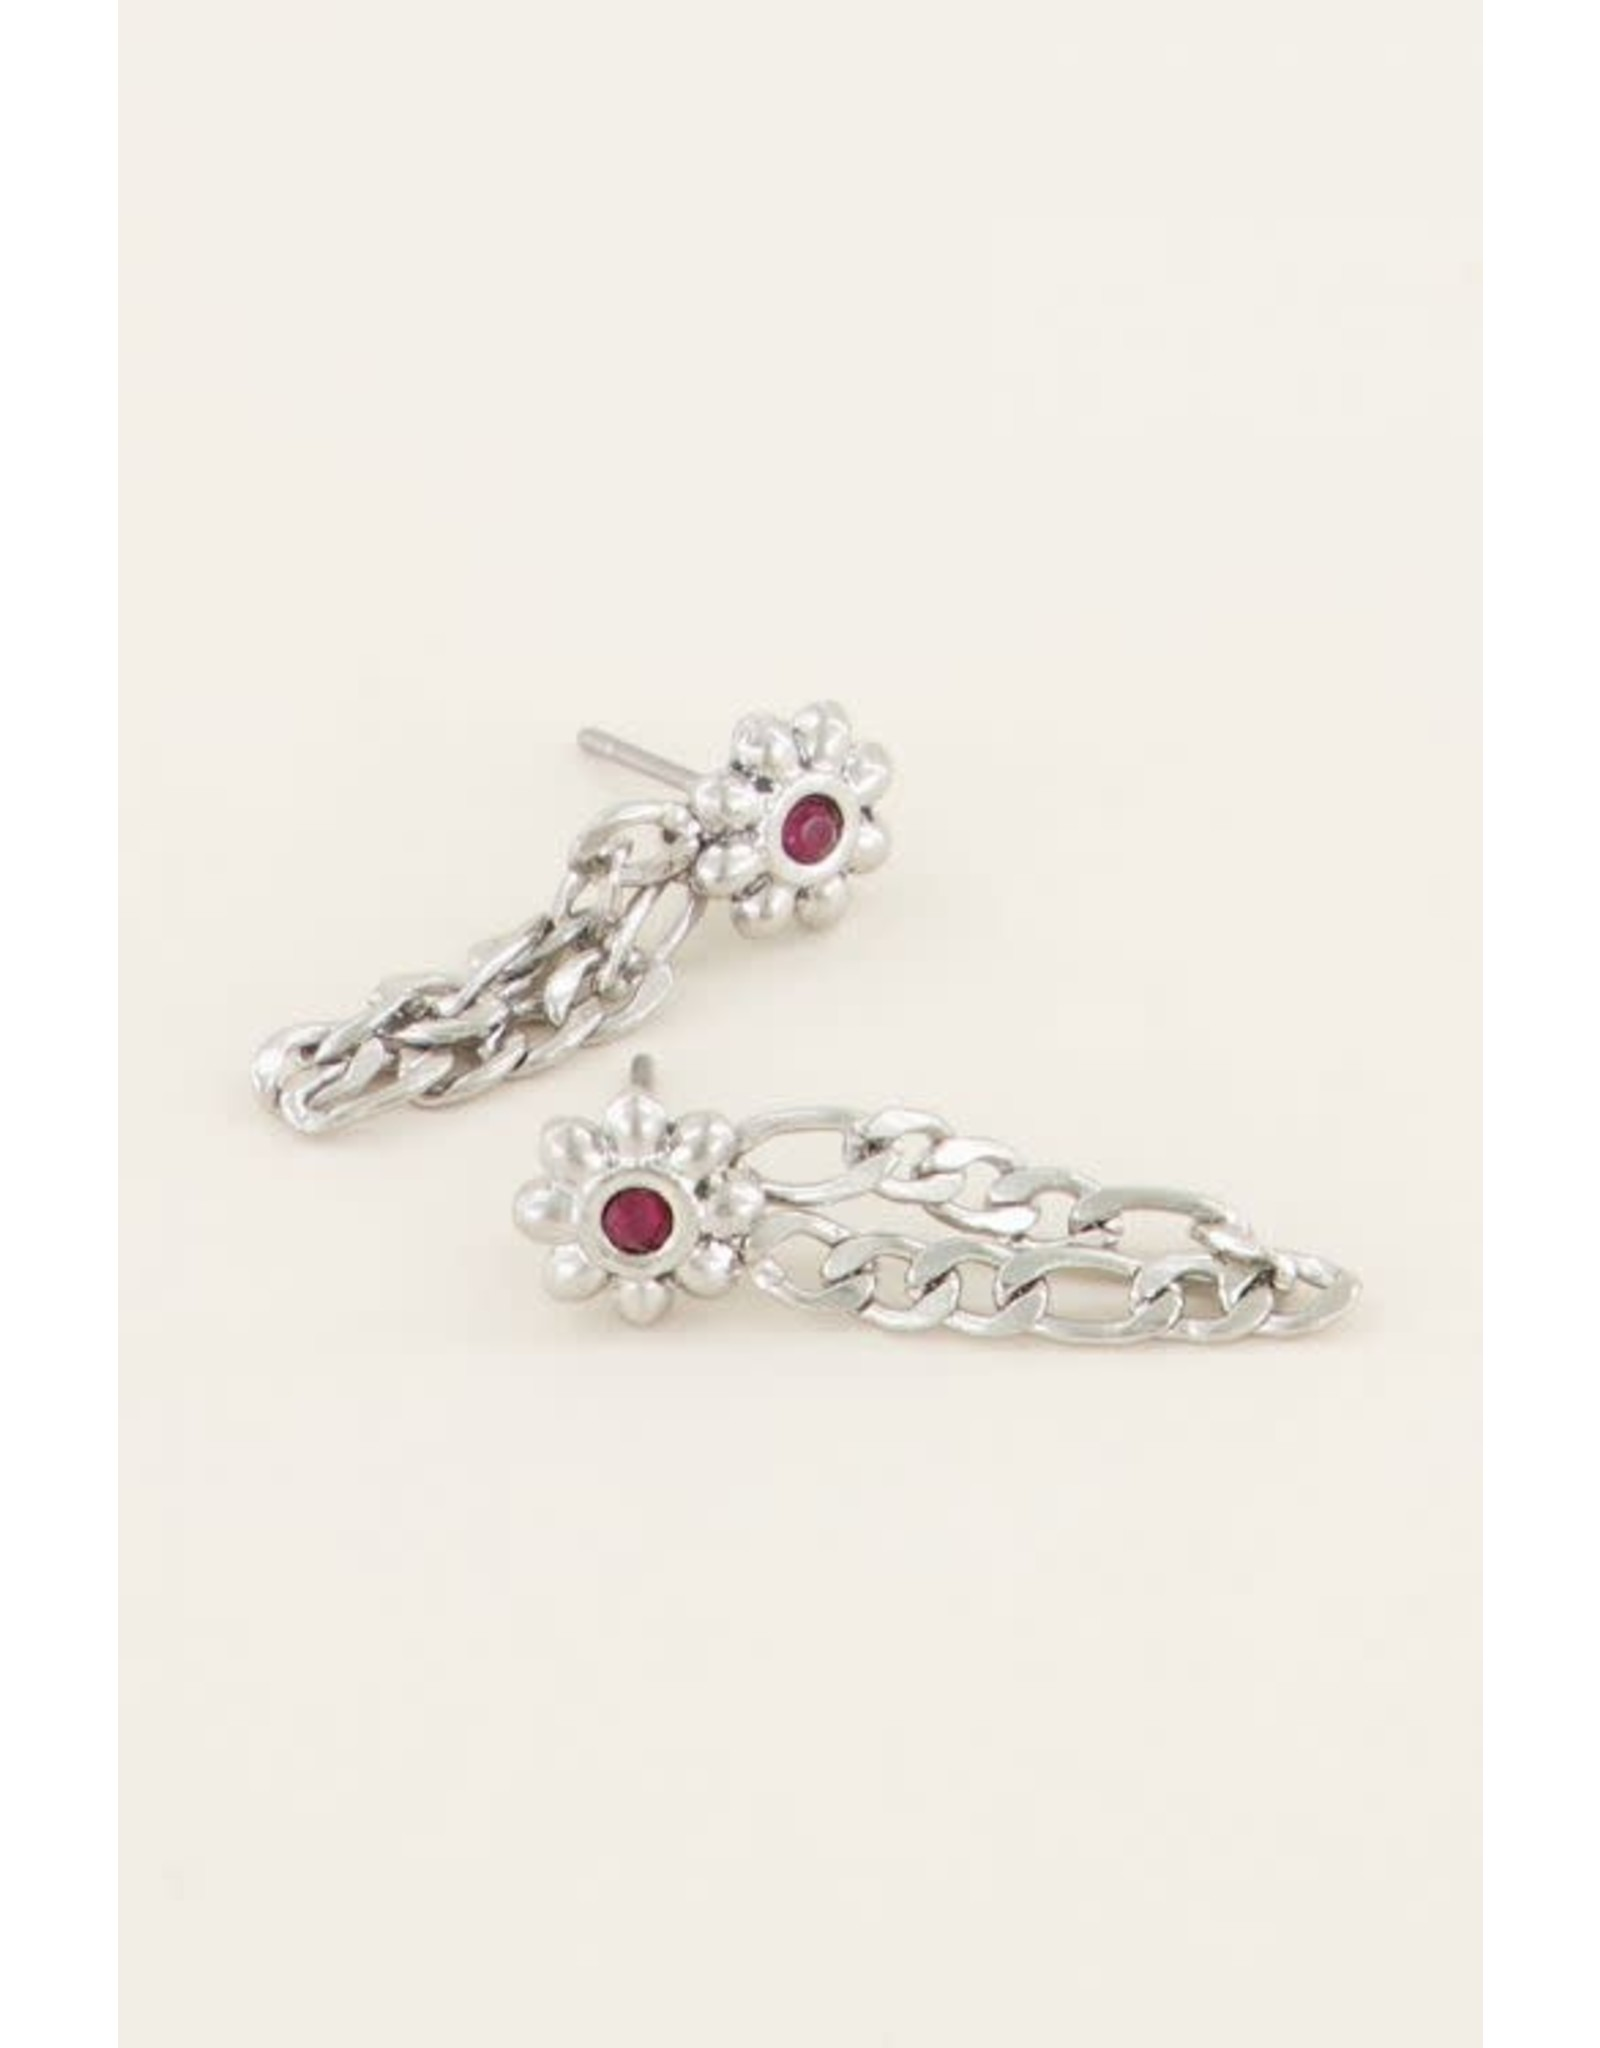 My Jewellery My Jewellery oorhangers bloem en steentje